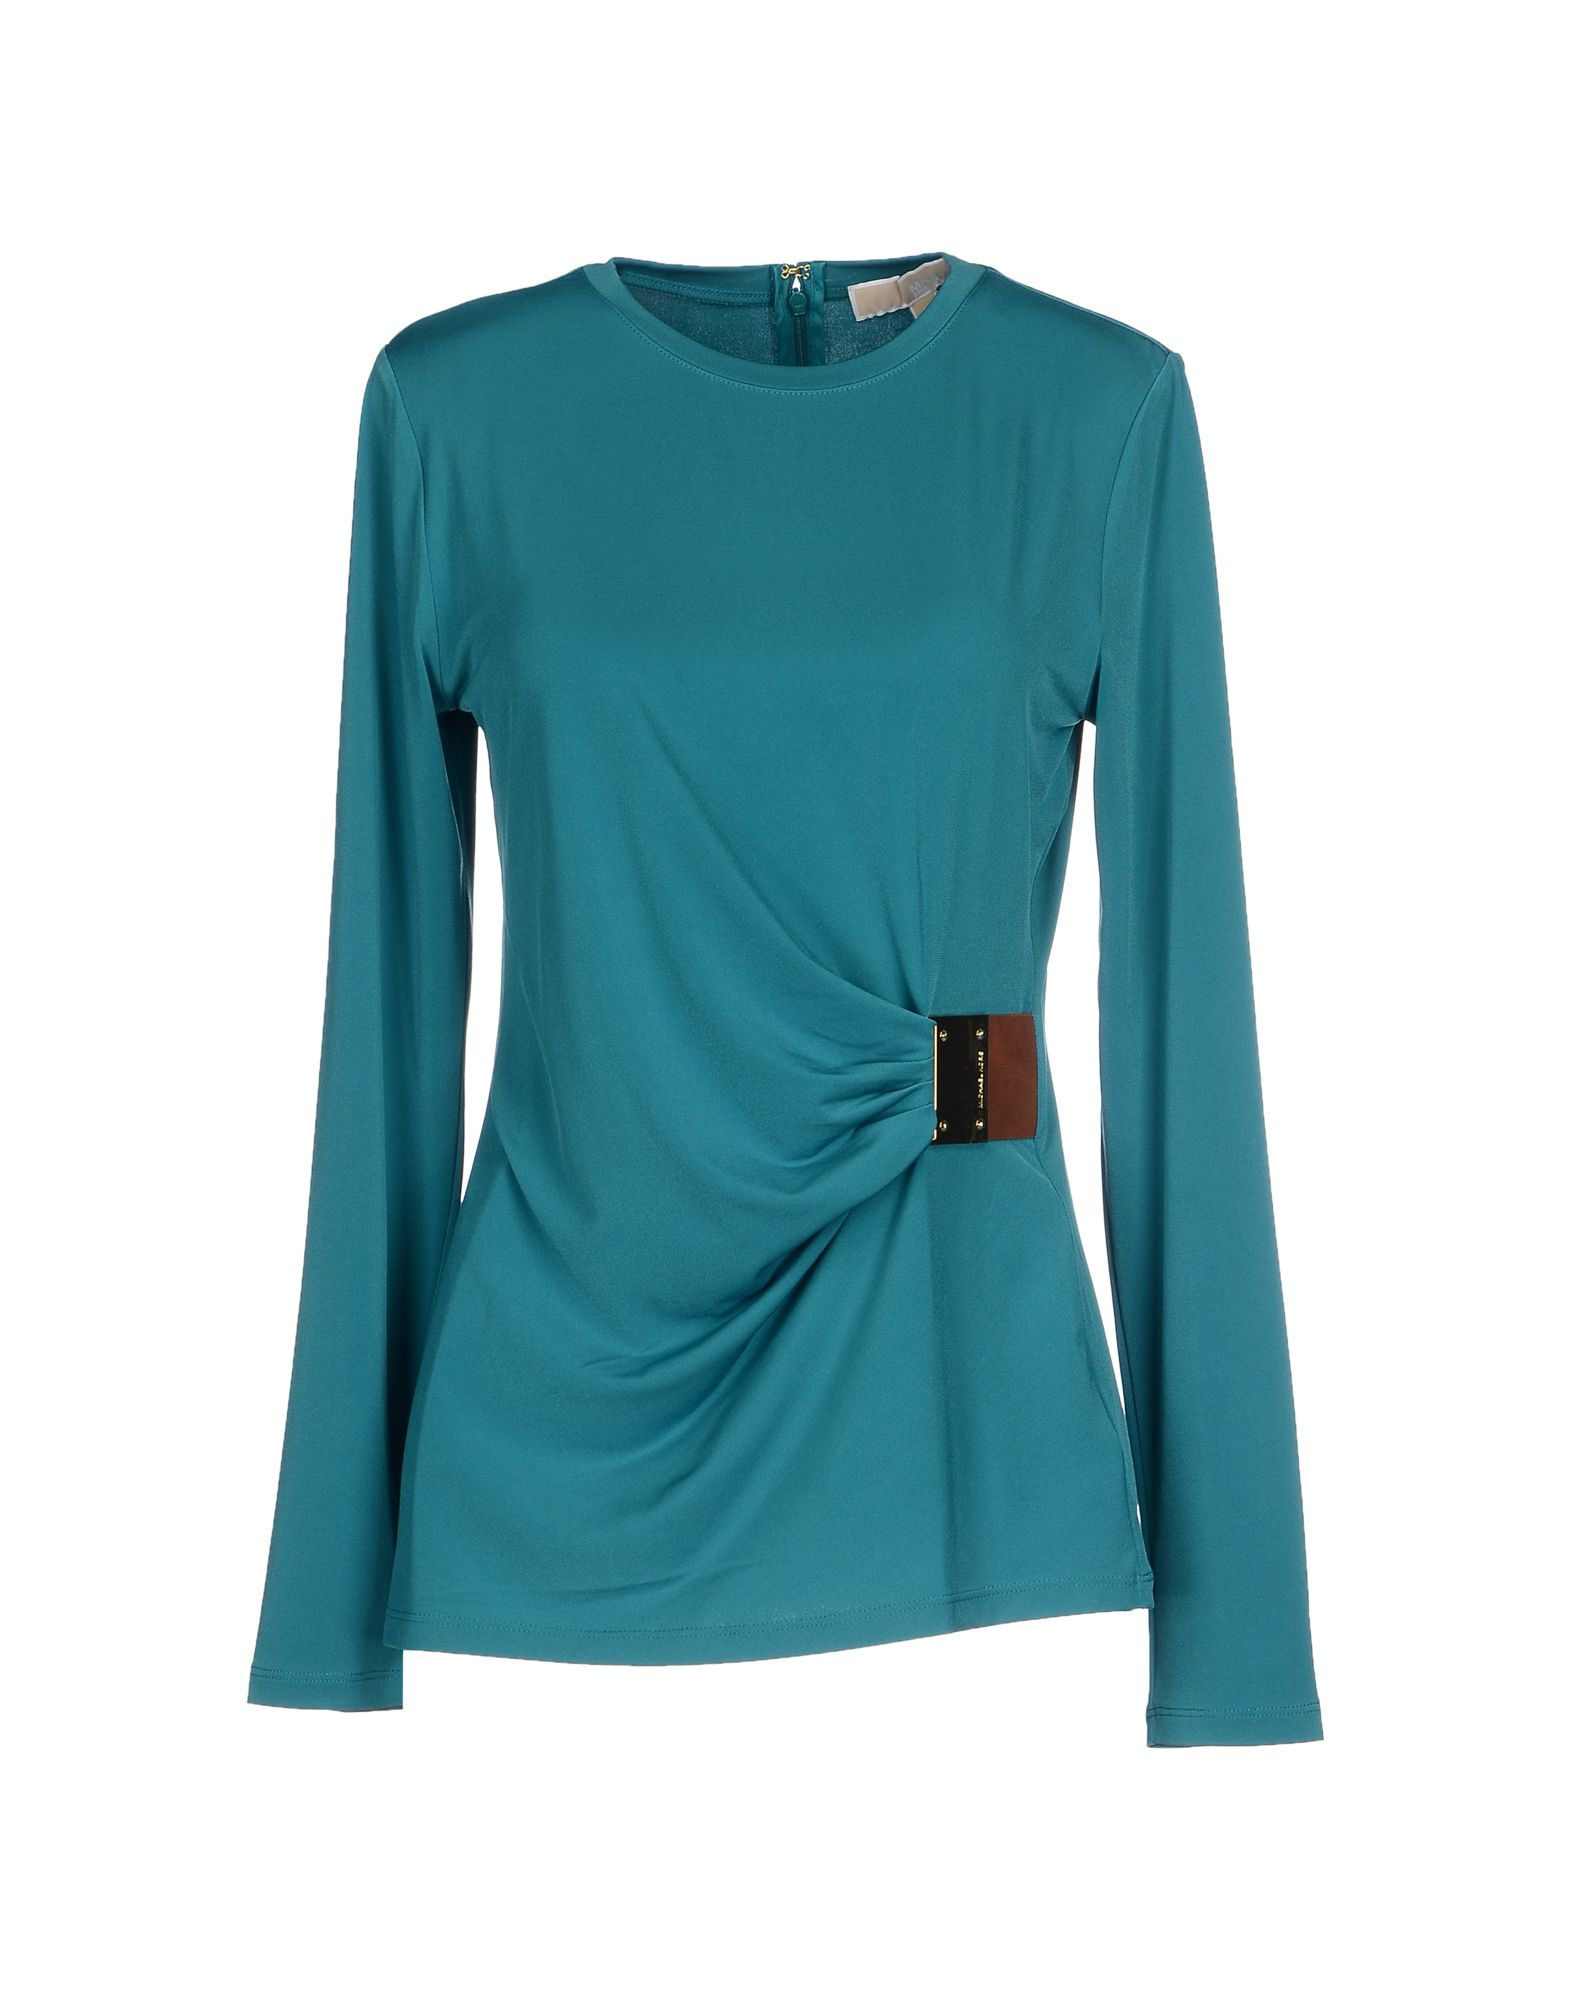 michael michael kors t shirt in blue lyst. Black Bedroom Furniture Sets. Home Design Ideas